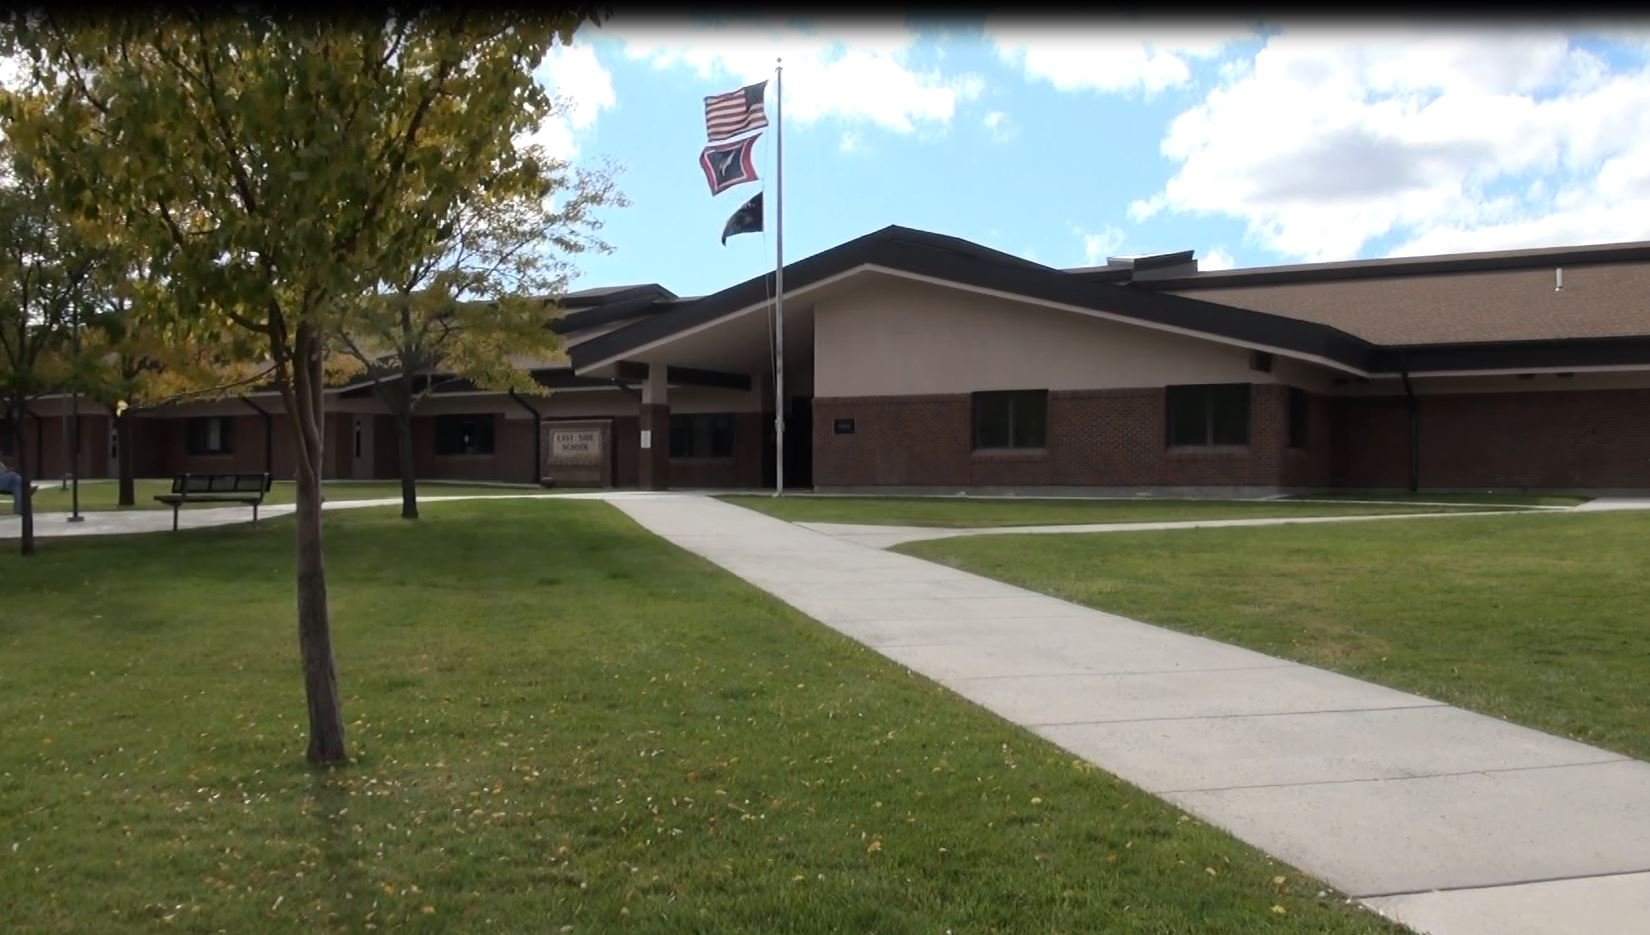 Wyoming school district considers plan to arm teachers and volunteers